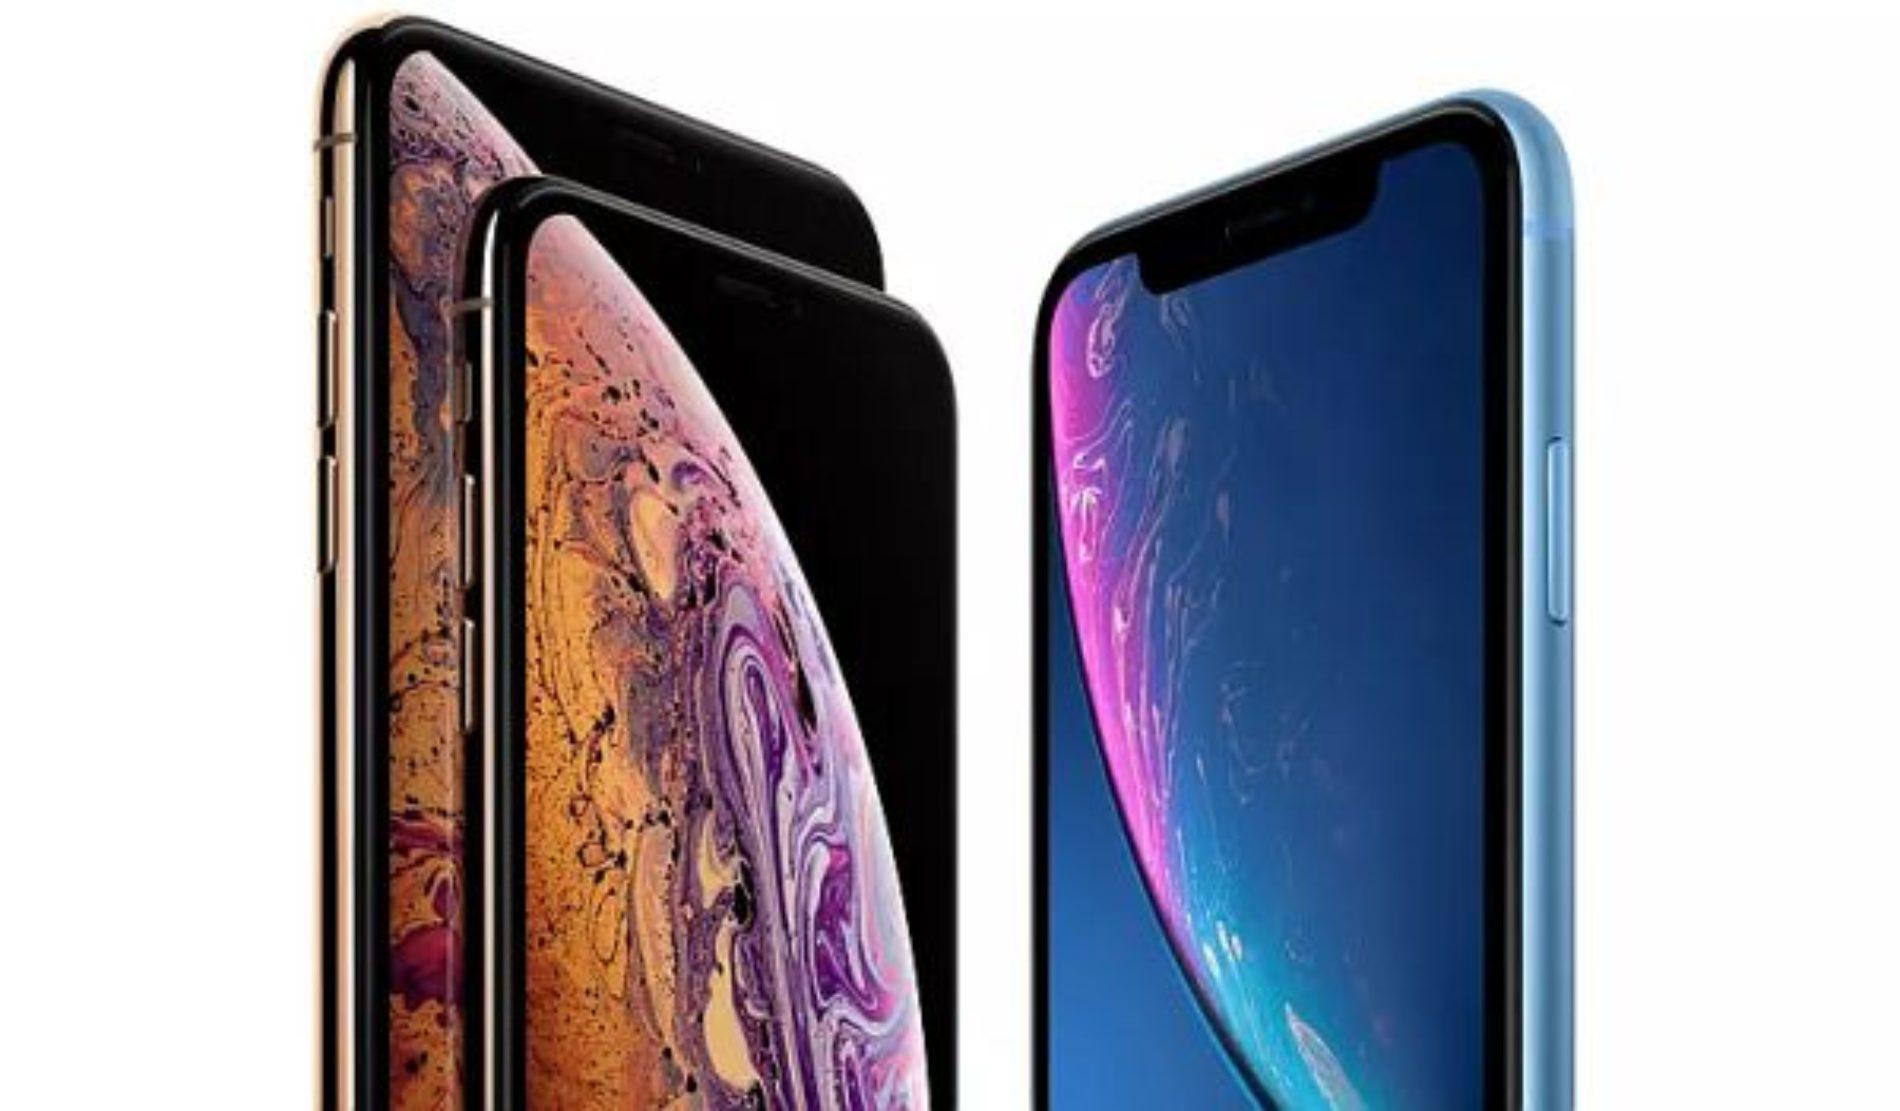 Aqui las diferencias mas grandes entre el iPhone XS, iPhone XS Max y iPhone XR